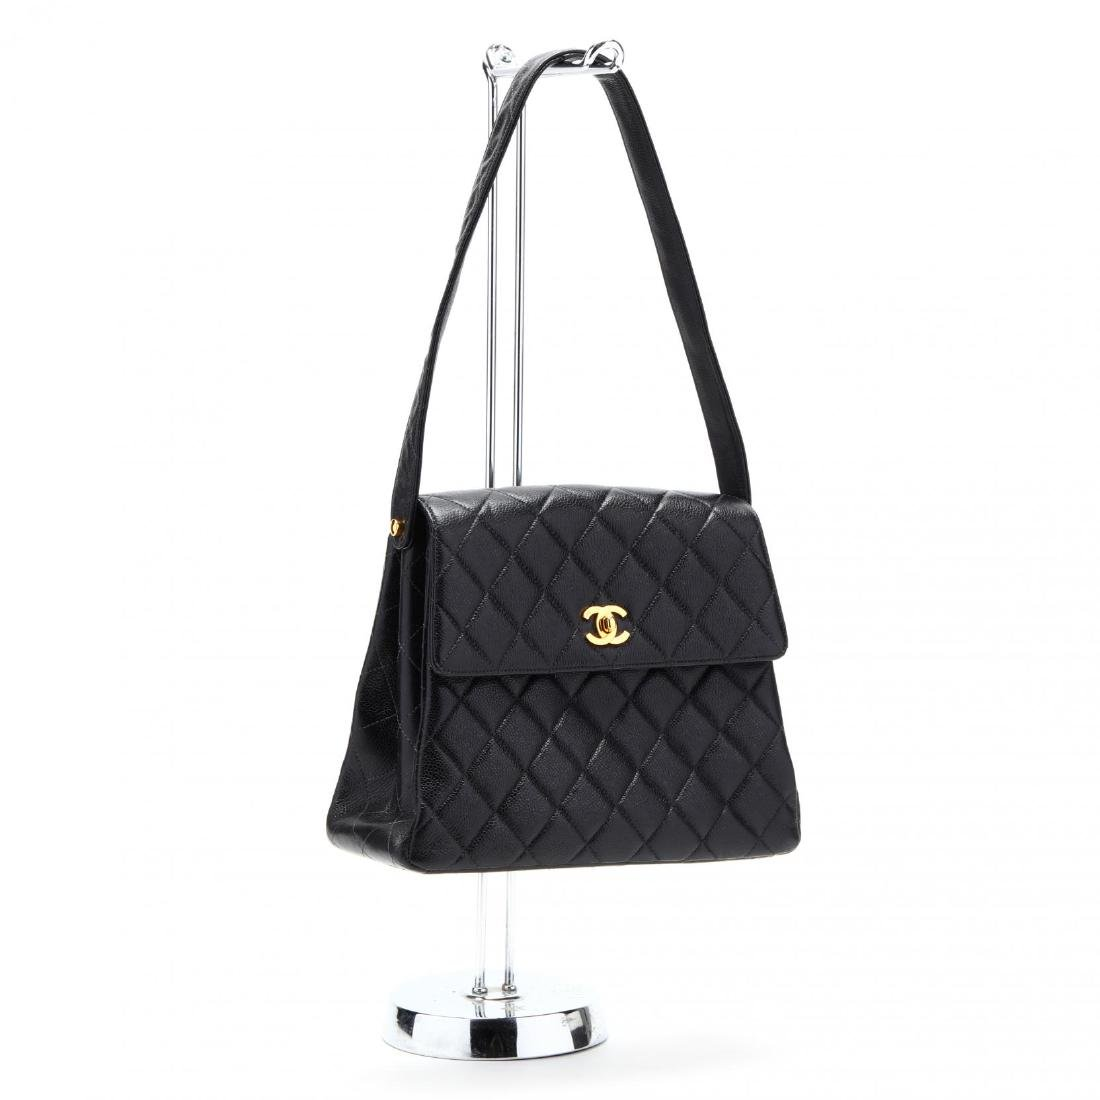 Caviar Leather Trapeze Flap Handbag, Chanel - 3